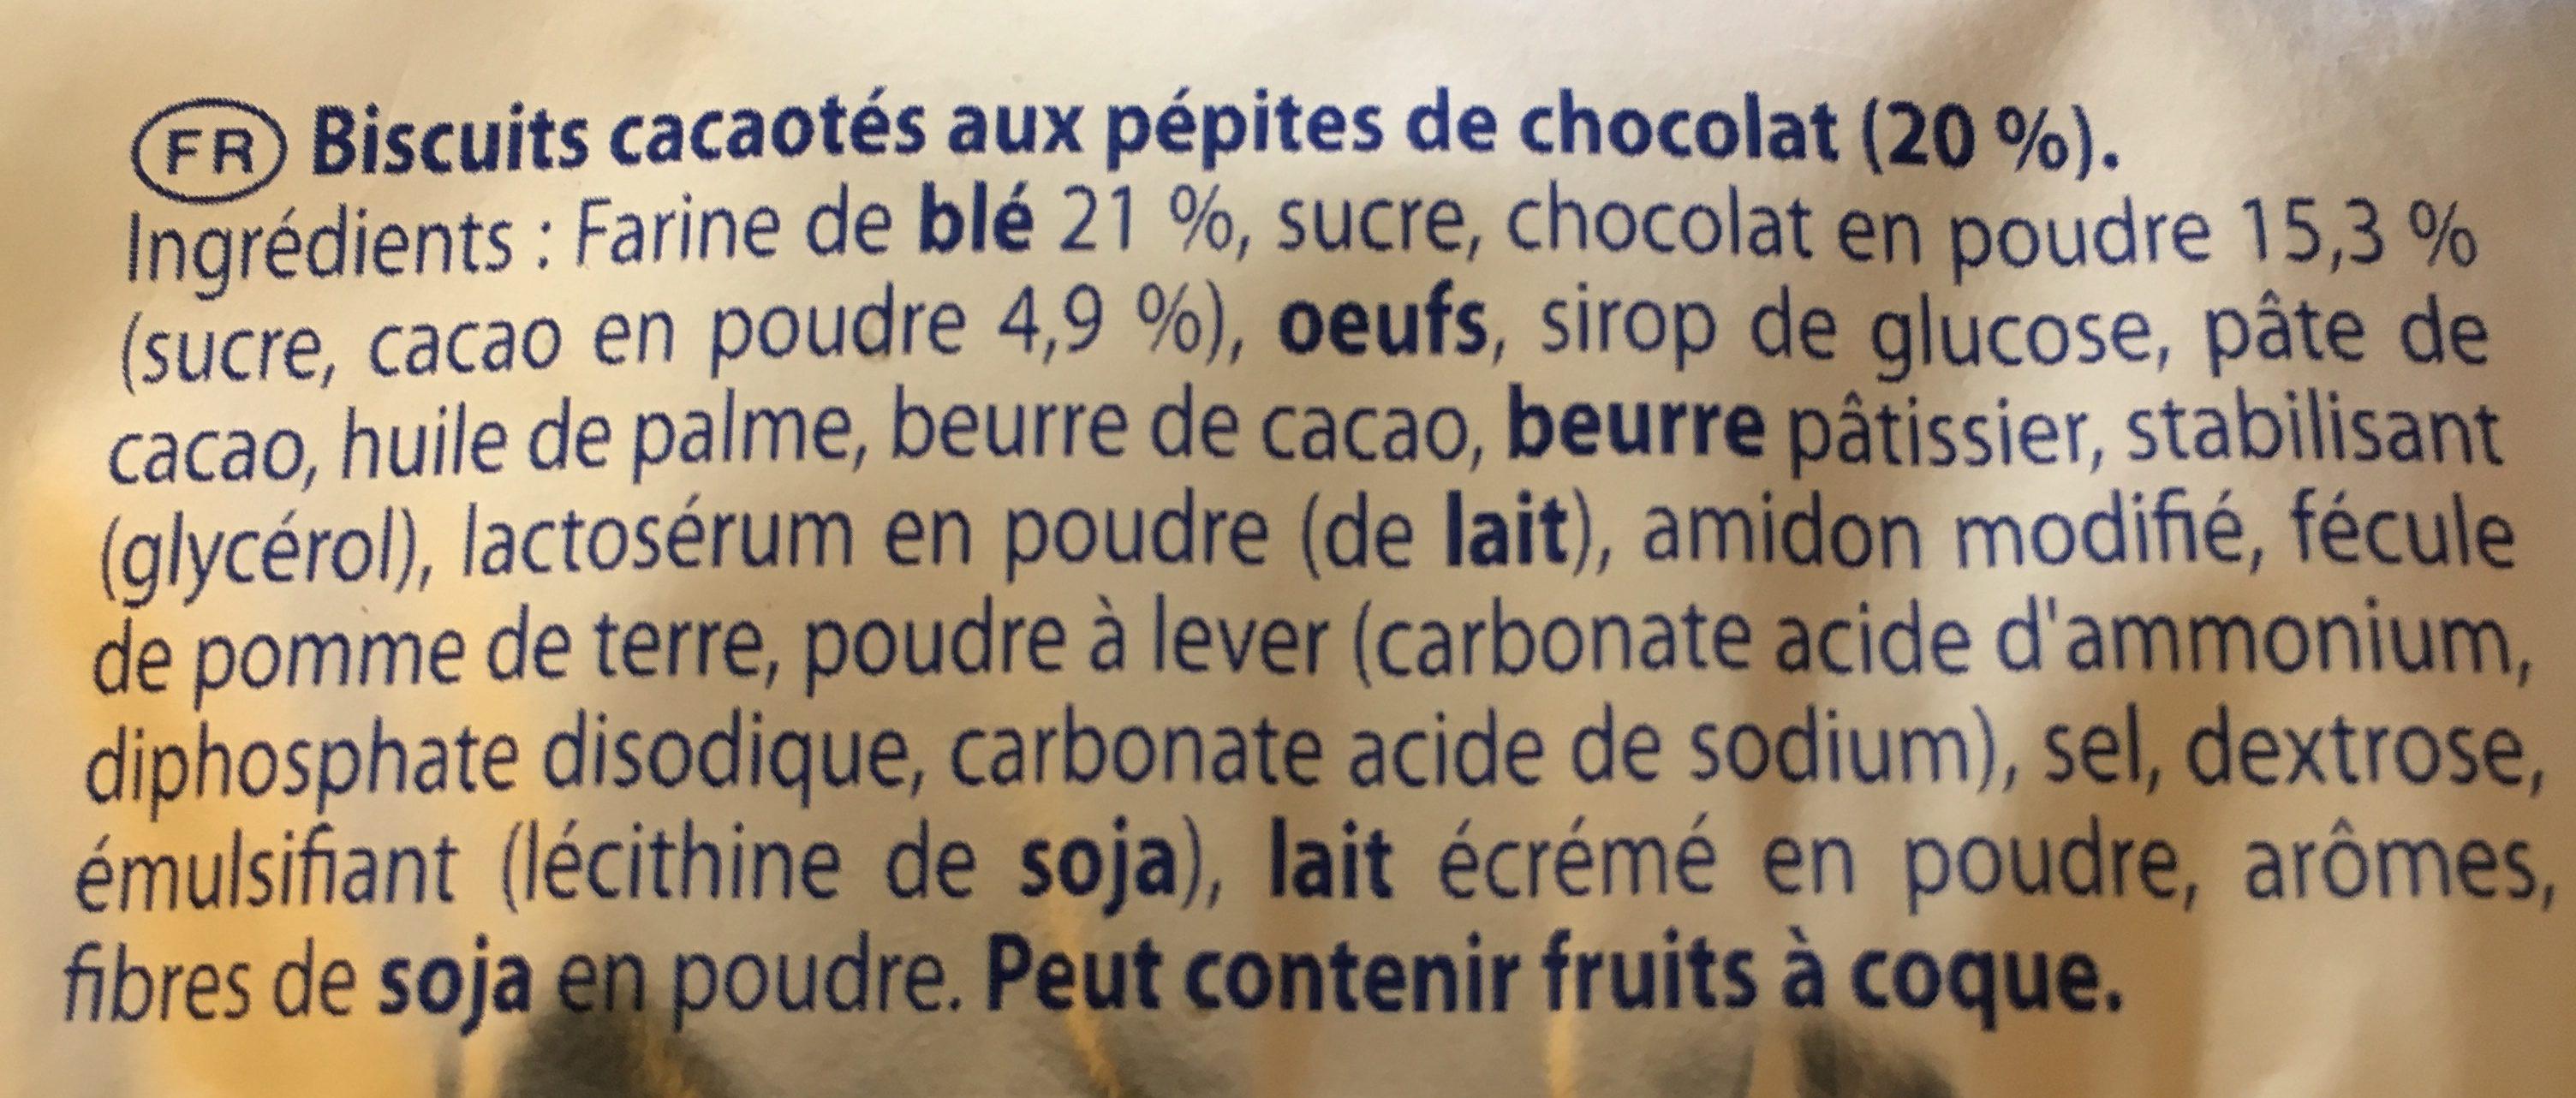 Granola Cœur Extra Moelleux Tout Chocolat - Ingredients - fr